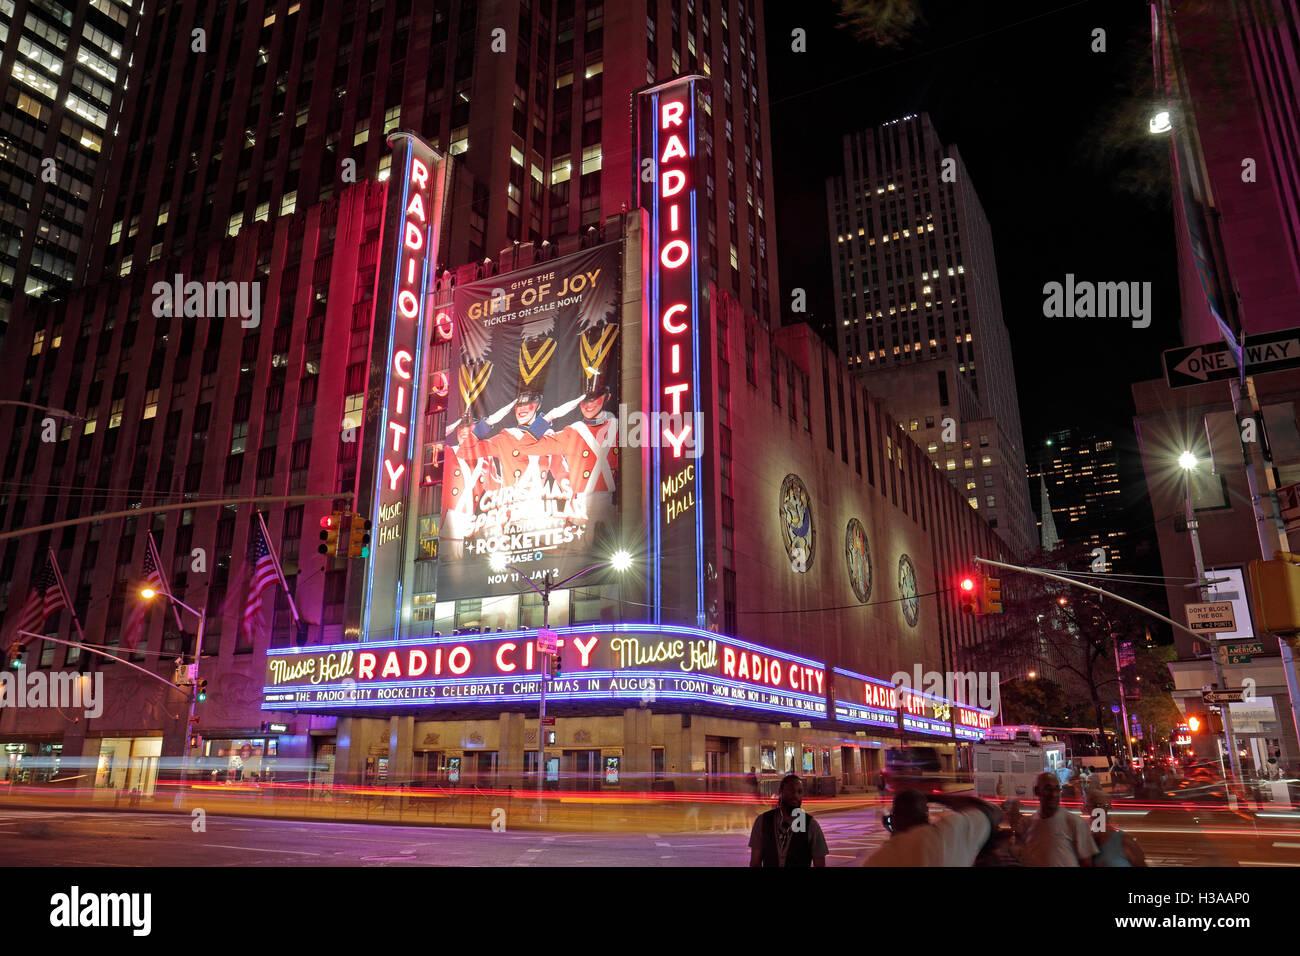 The Radio City Music Hall at night, New York City, United States. - Stock Image